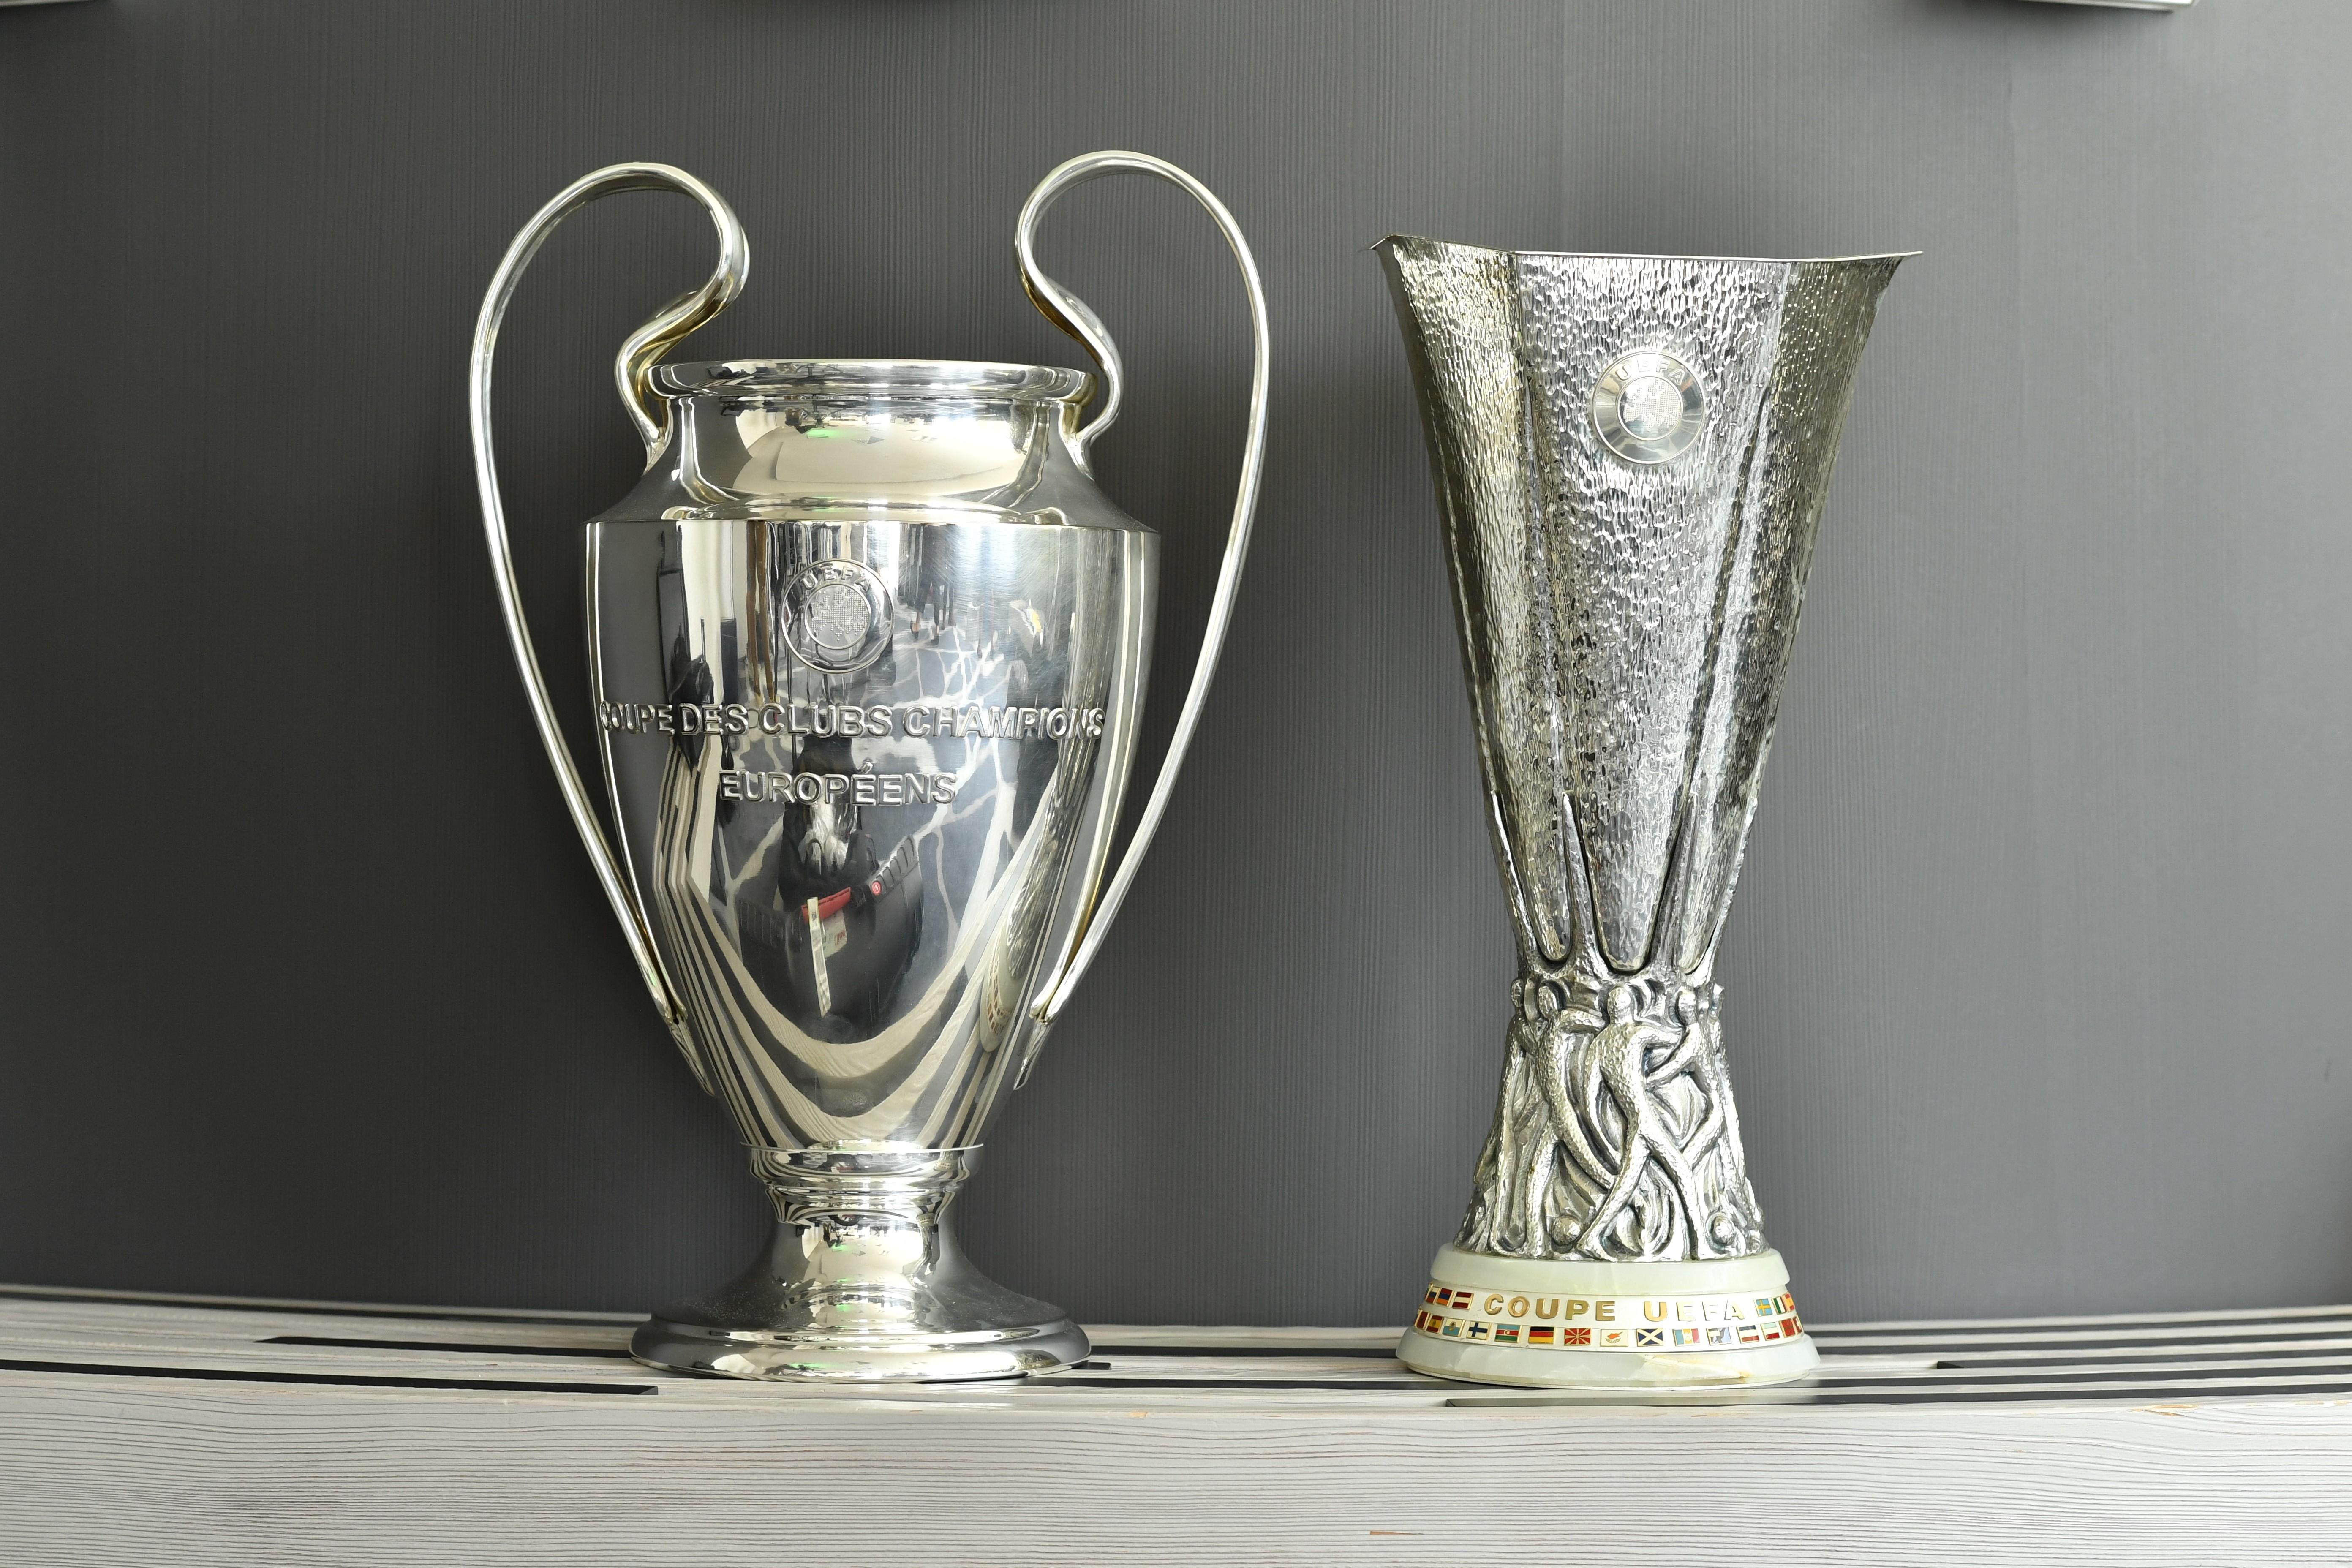 https://i.eurosport.com/2020/03/13/2794001.jpg